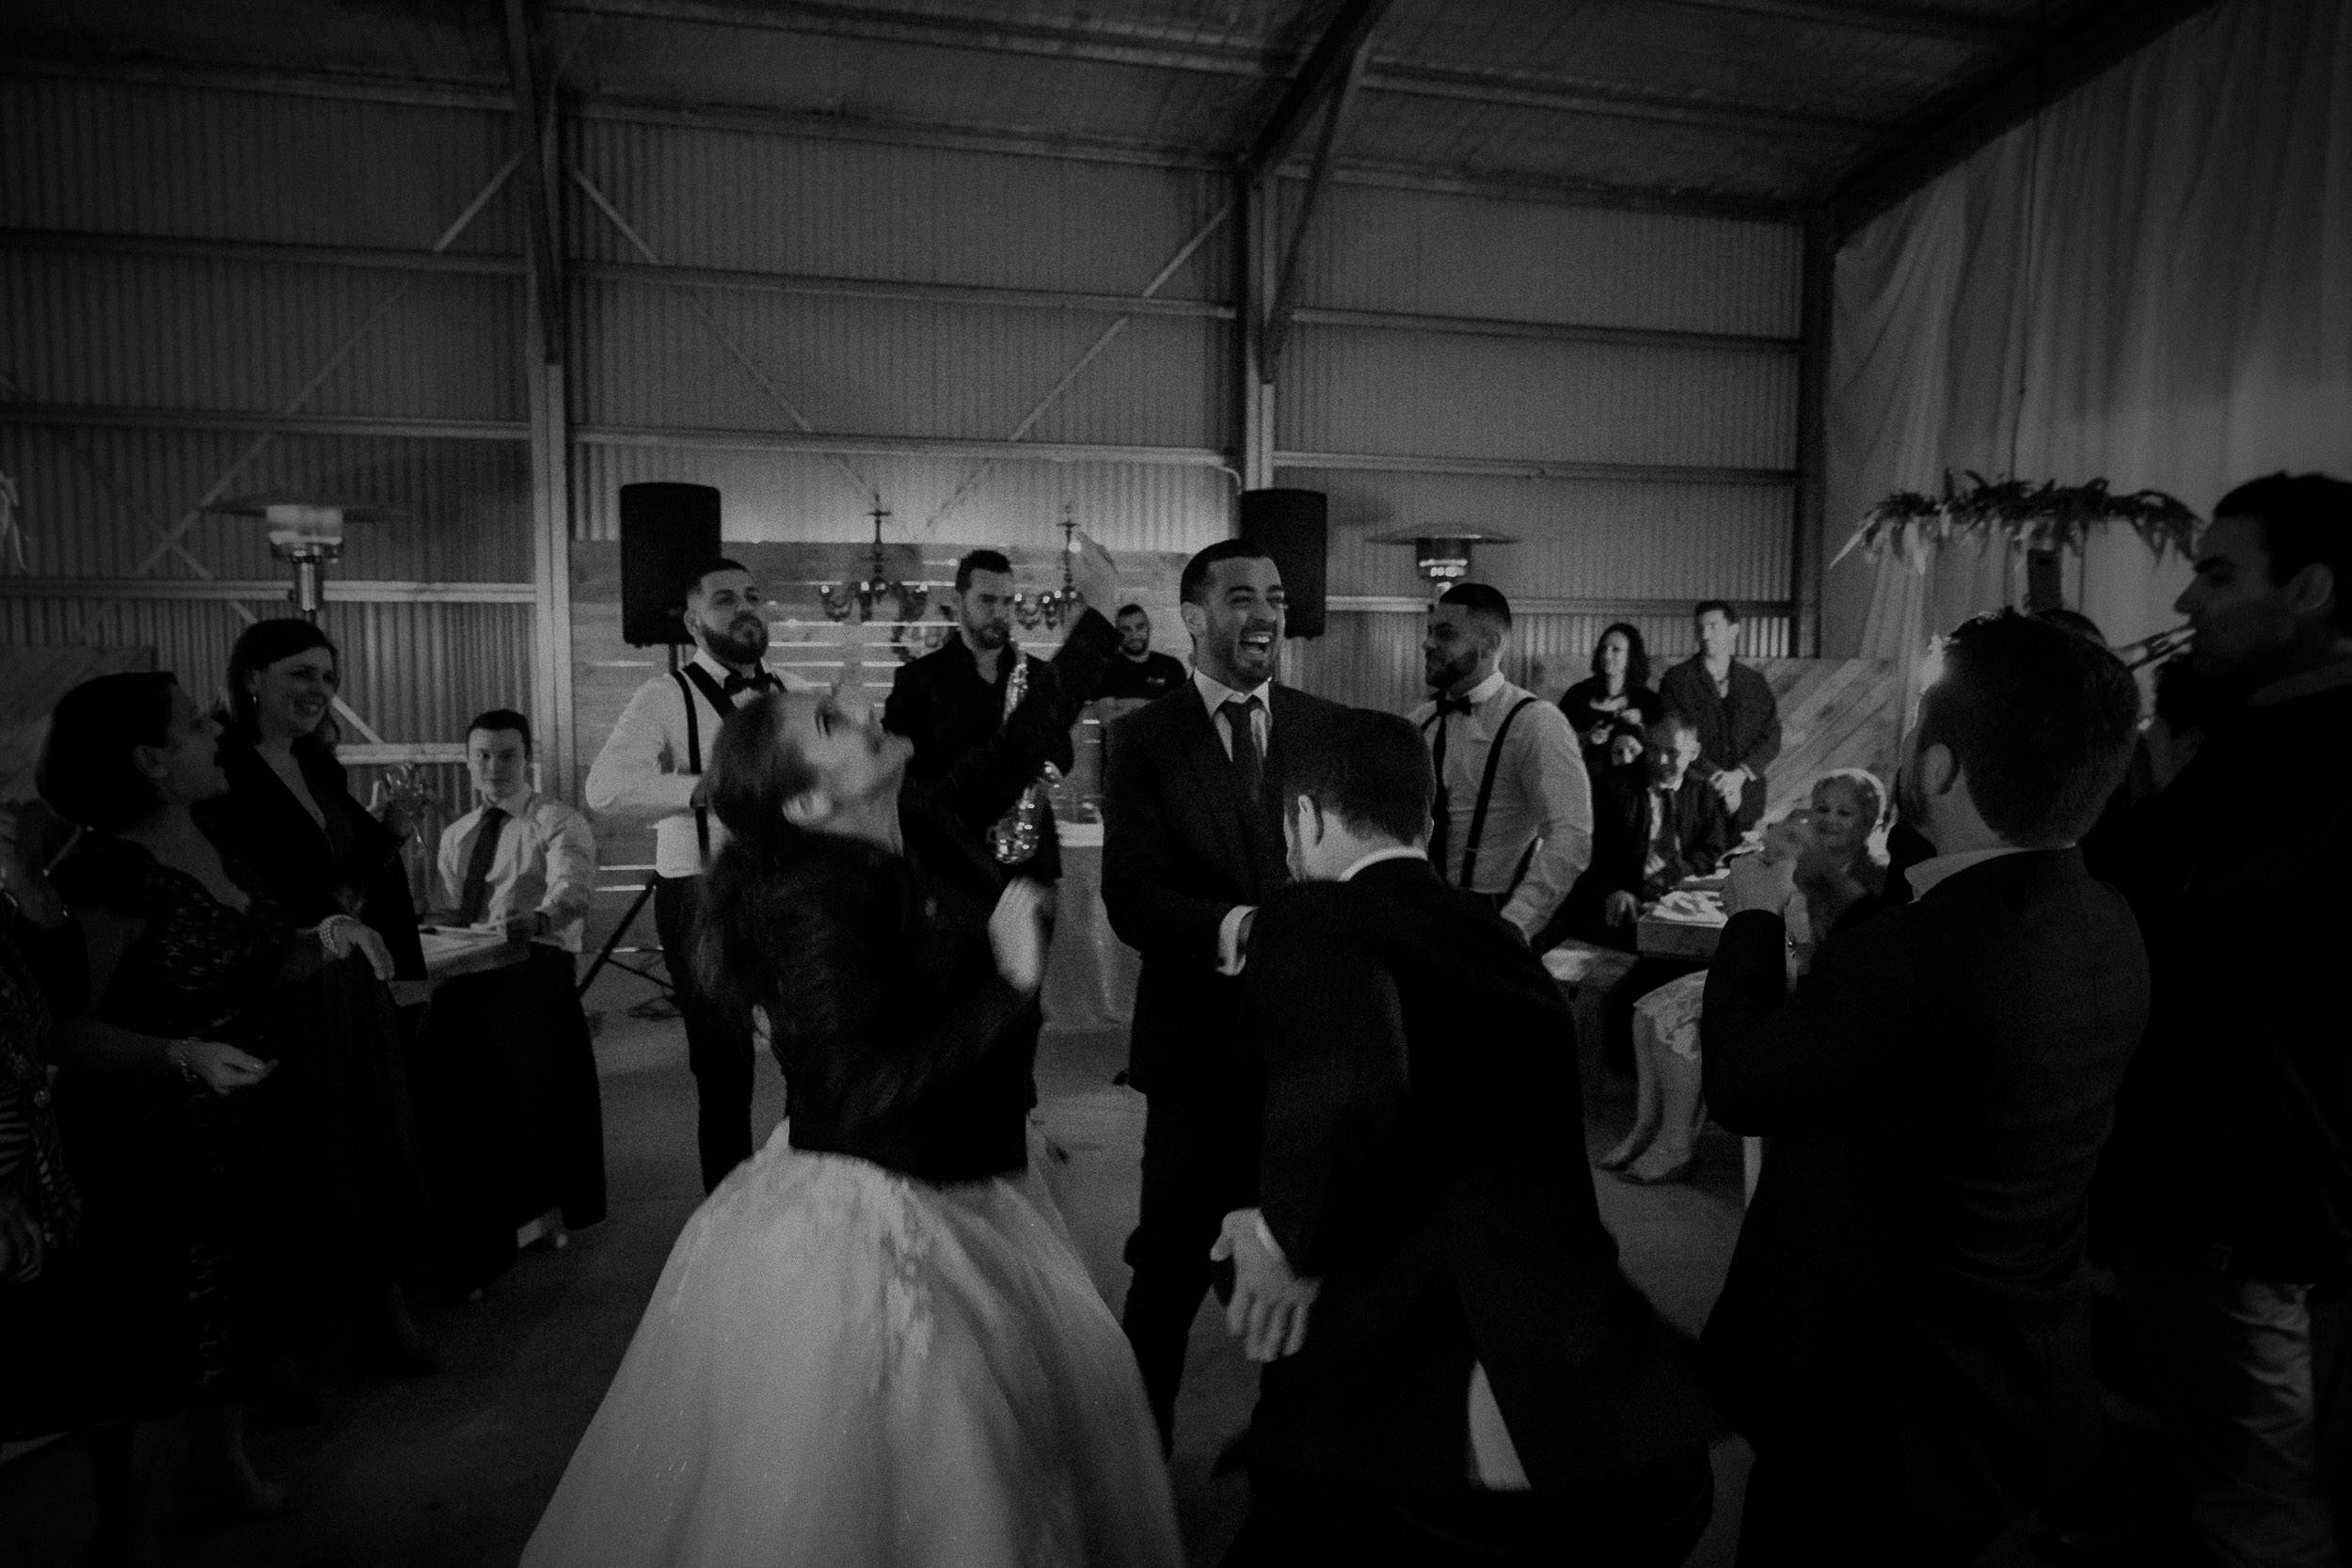 g_c wedding - kings _ thieves elopement wedding photography - blog 109.jpg